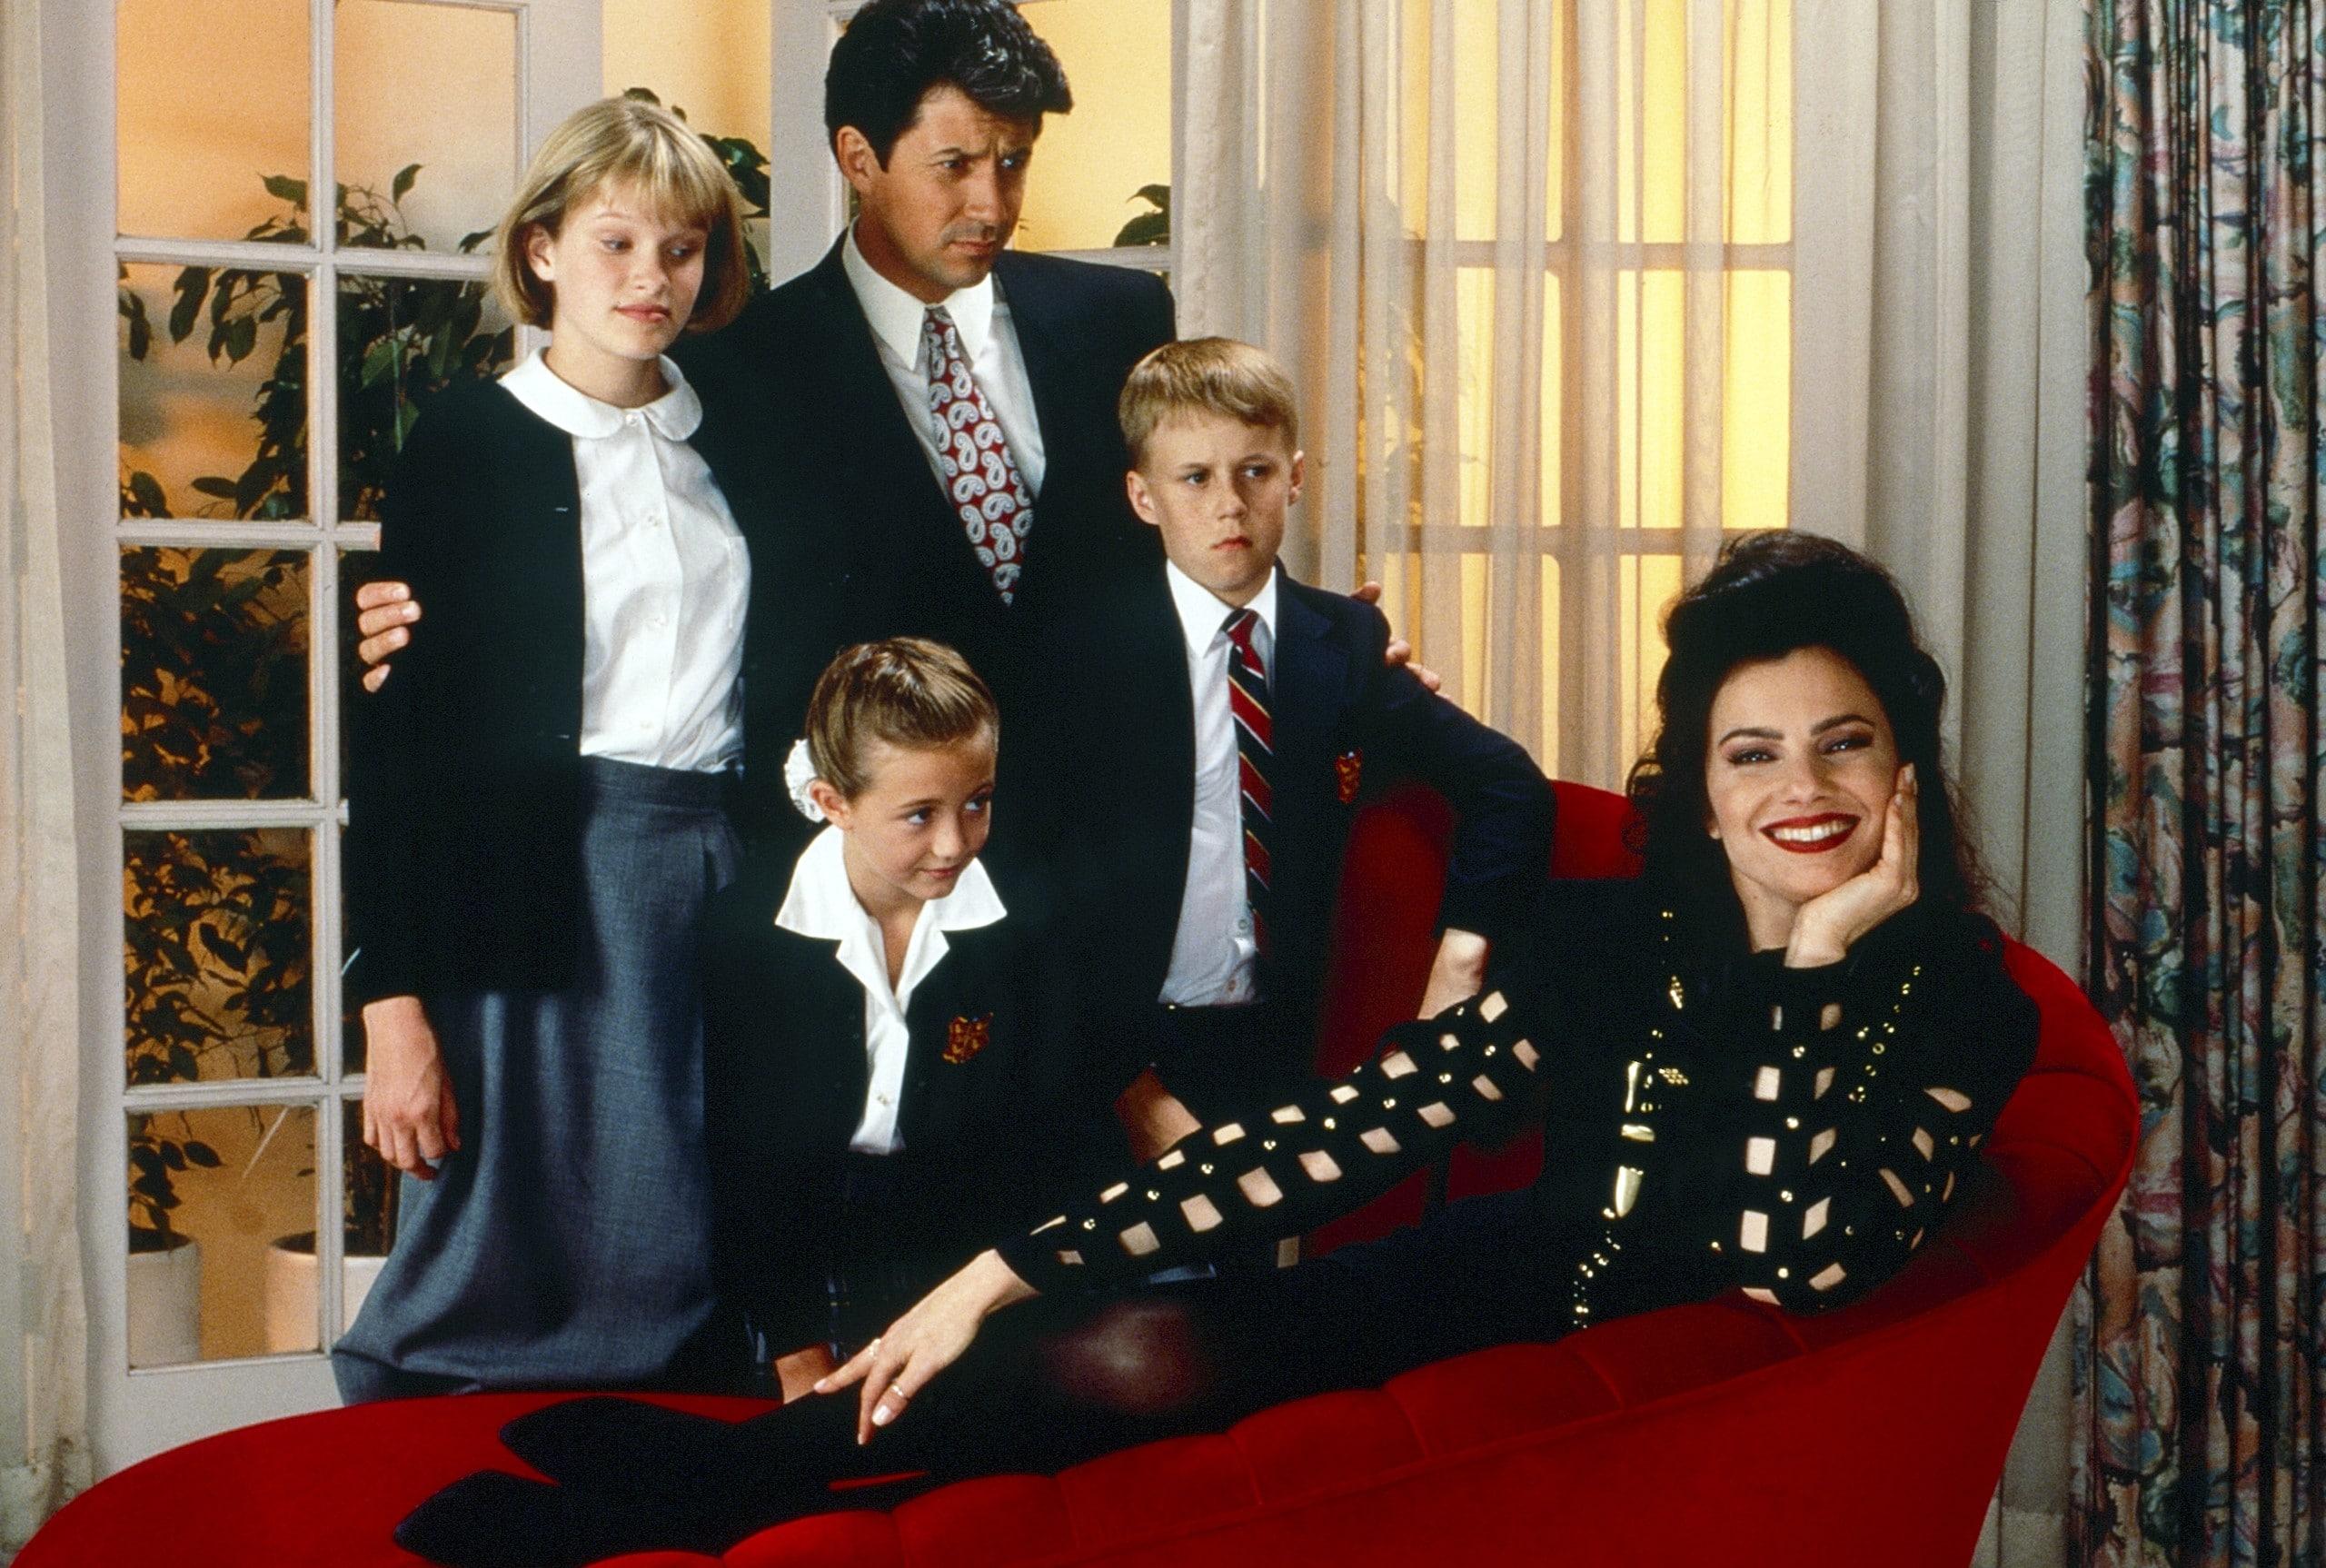 THE NANNY, from left: Nicholle Tom, Madeline Zima, Charles Shaughnessy, Benjamin Salisbury, Fran Drescher, 1993-1999